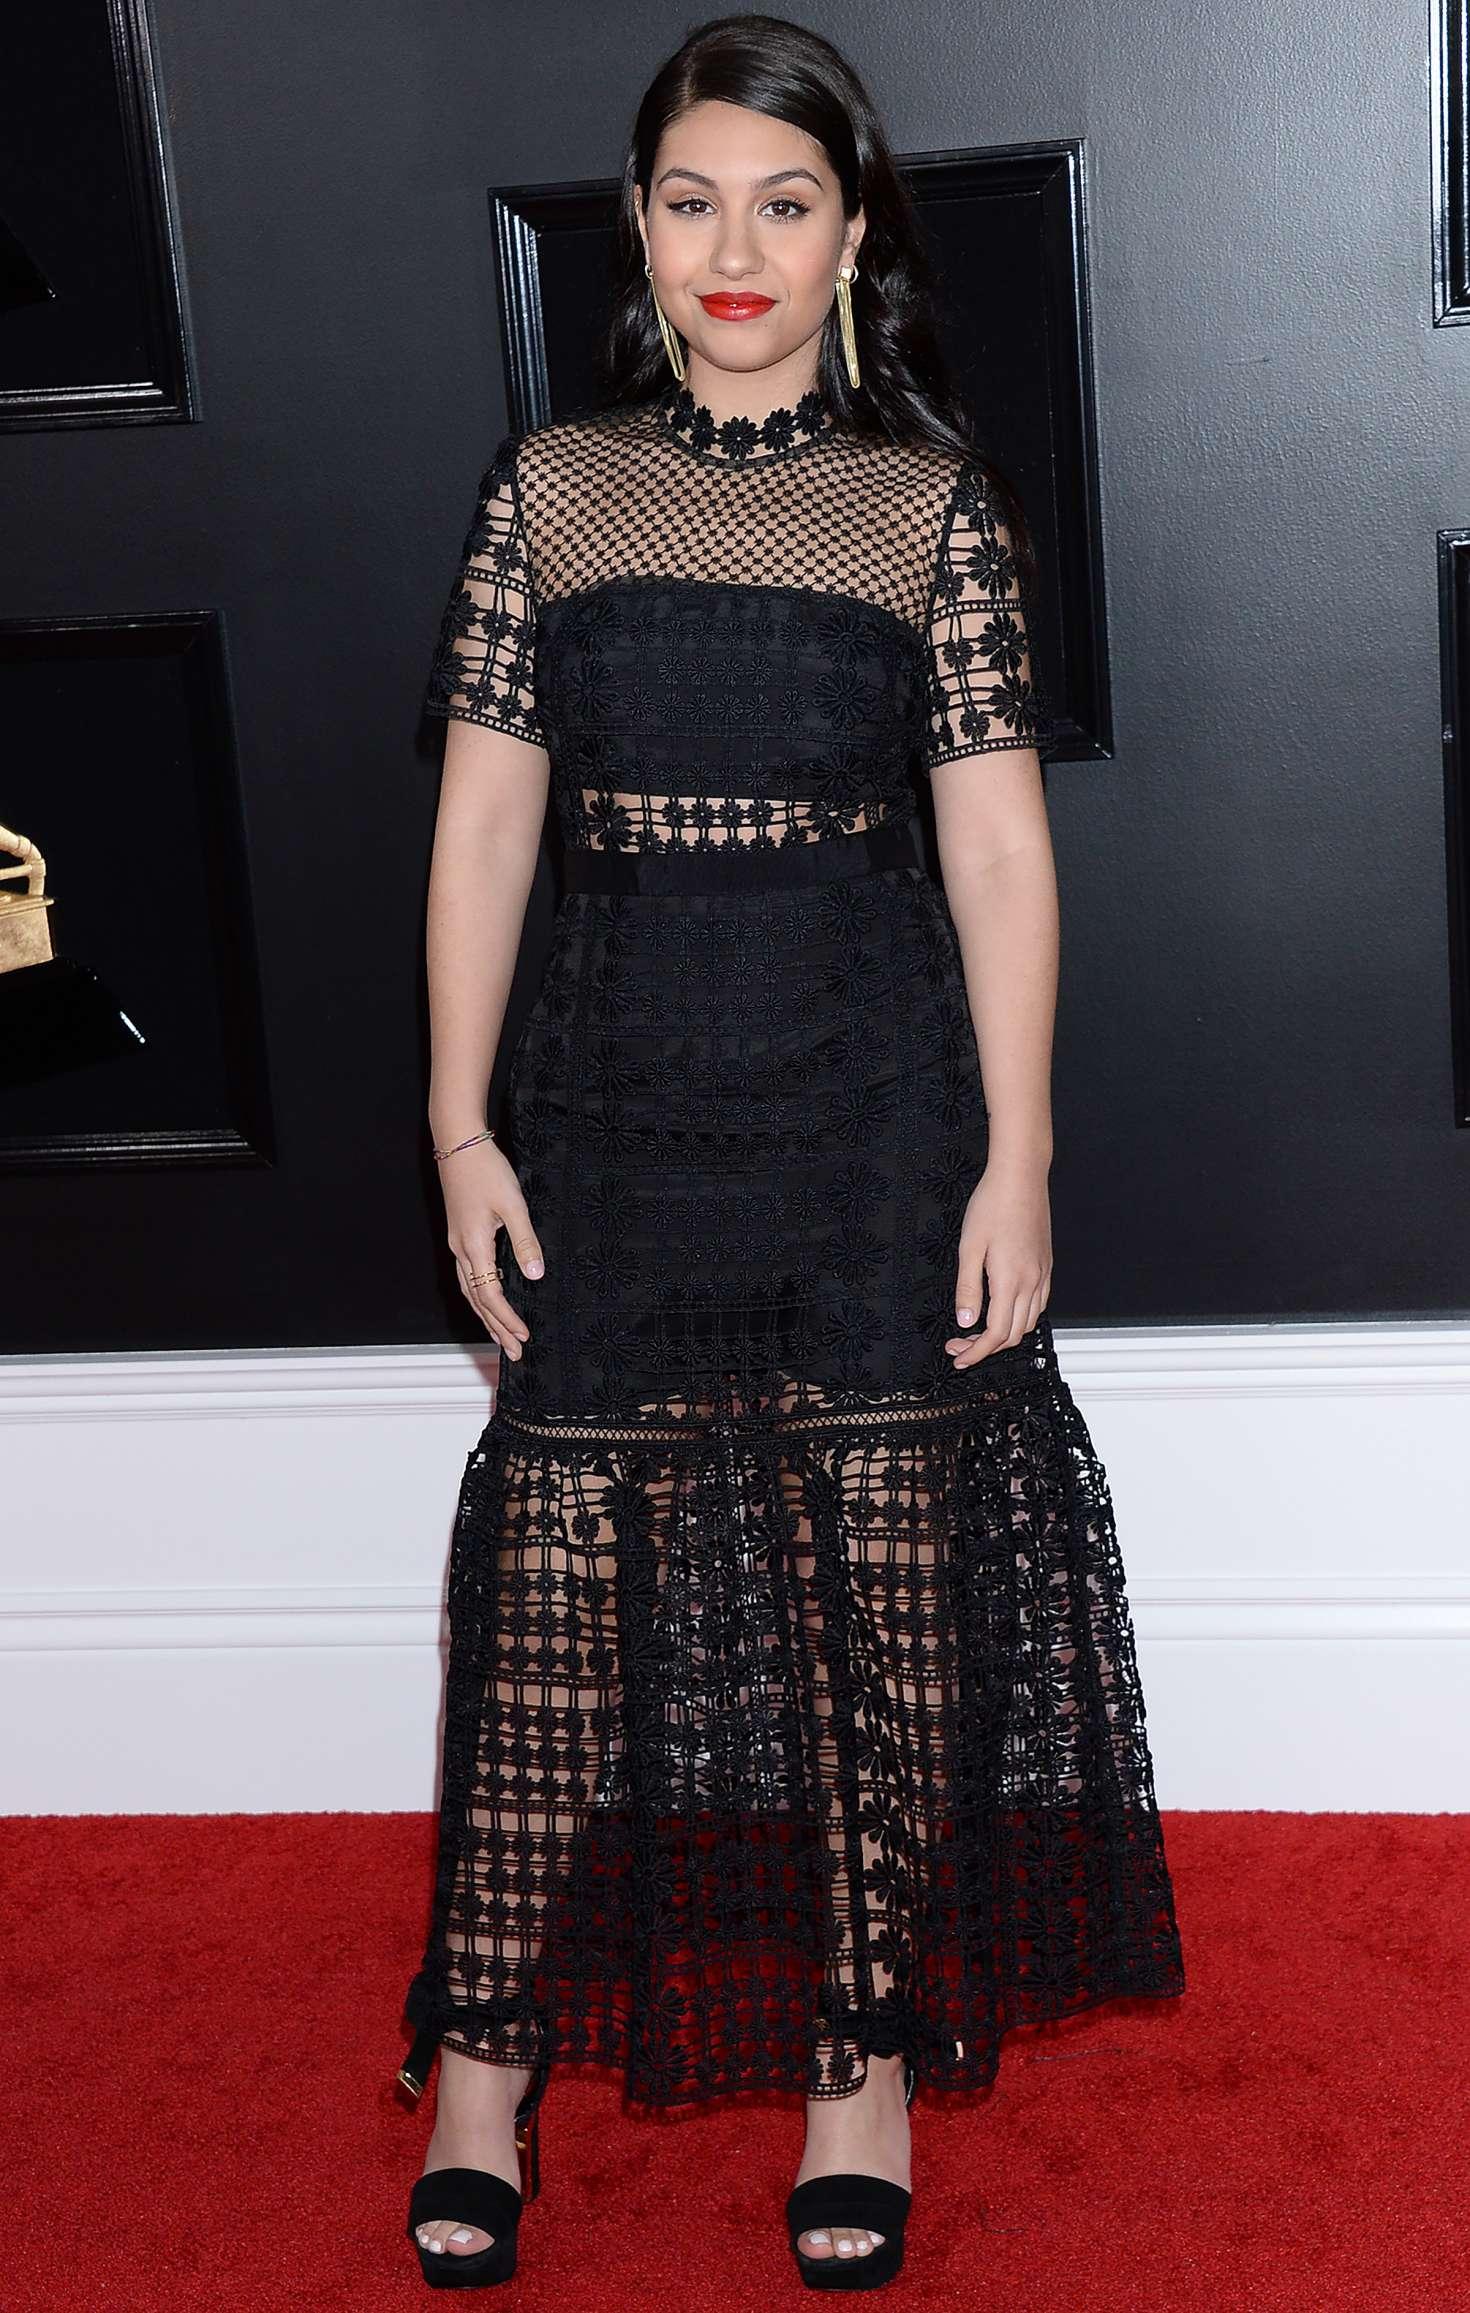 Alessia Cara - 2019 Grammy Awards in Los Angeles